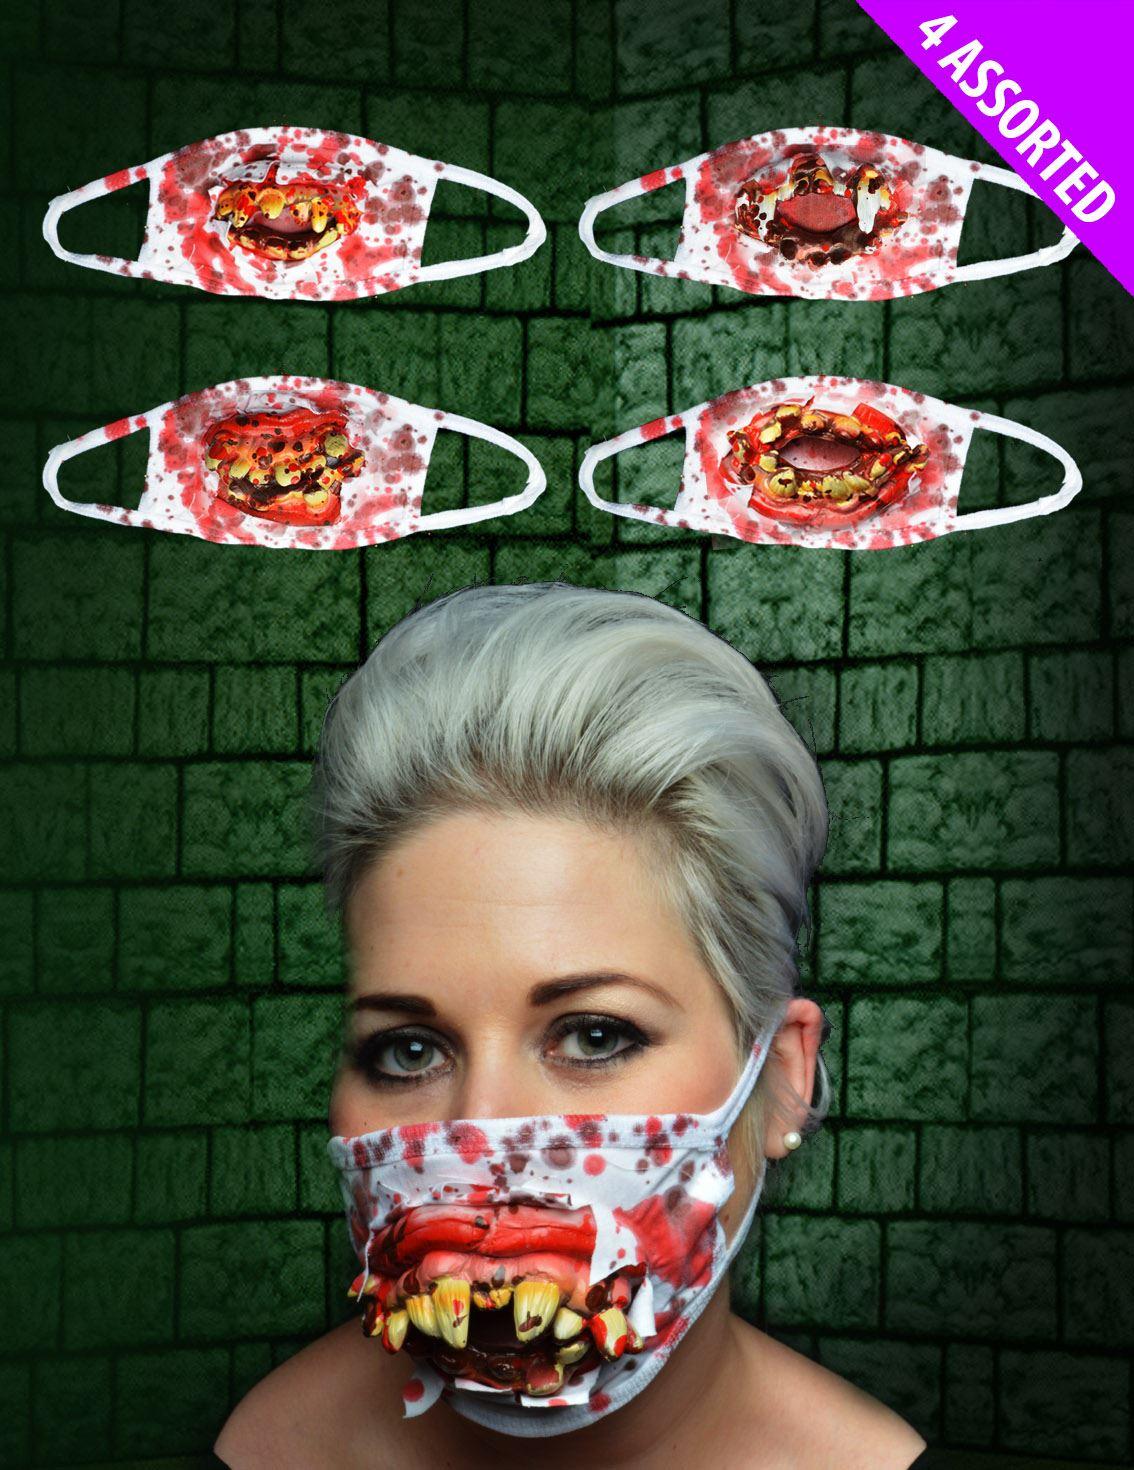 1x Halloween Zombie Surgeon Medical Mask with Goofy Teeth